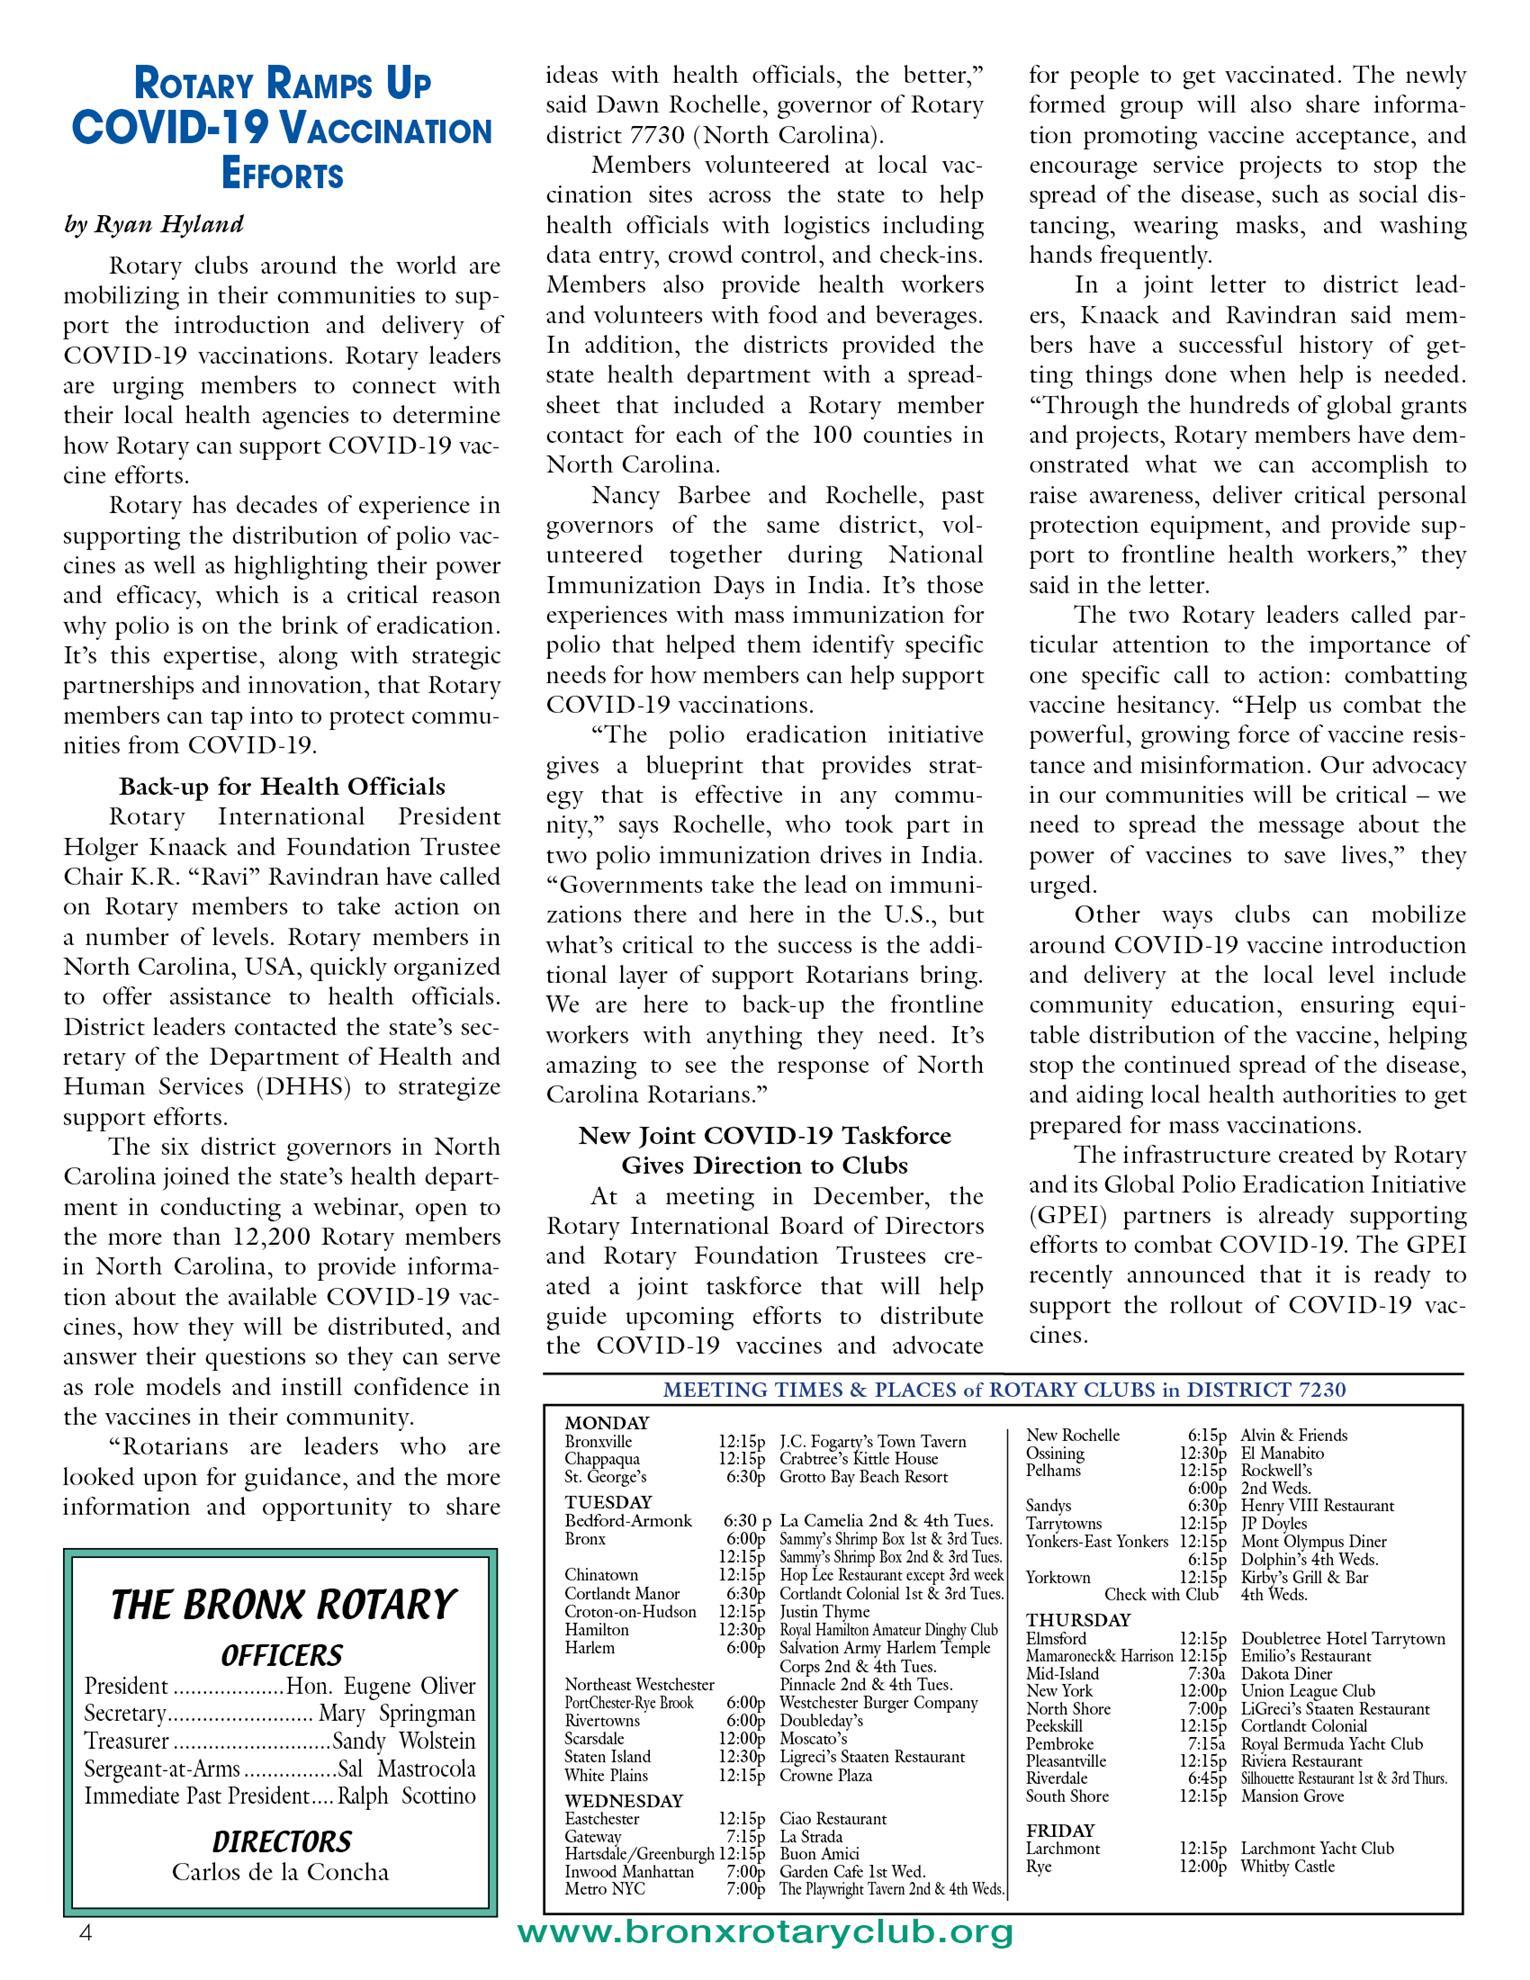 Tuesdays newsletter 1/26 & 2/2/2021 p4